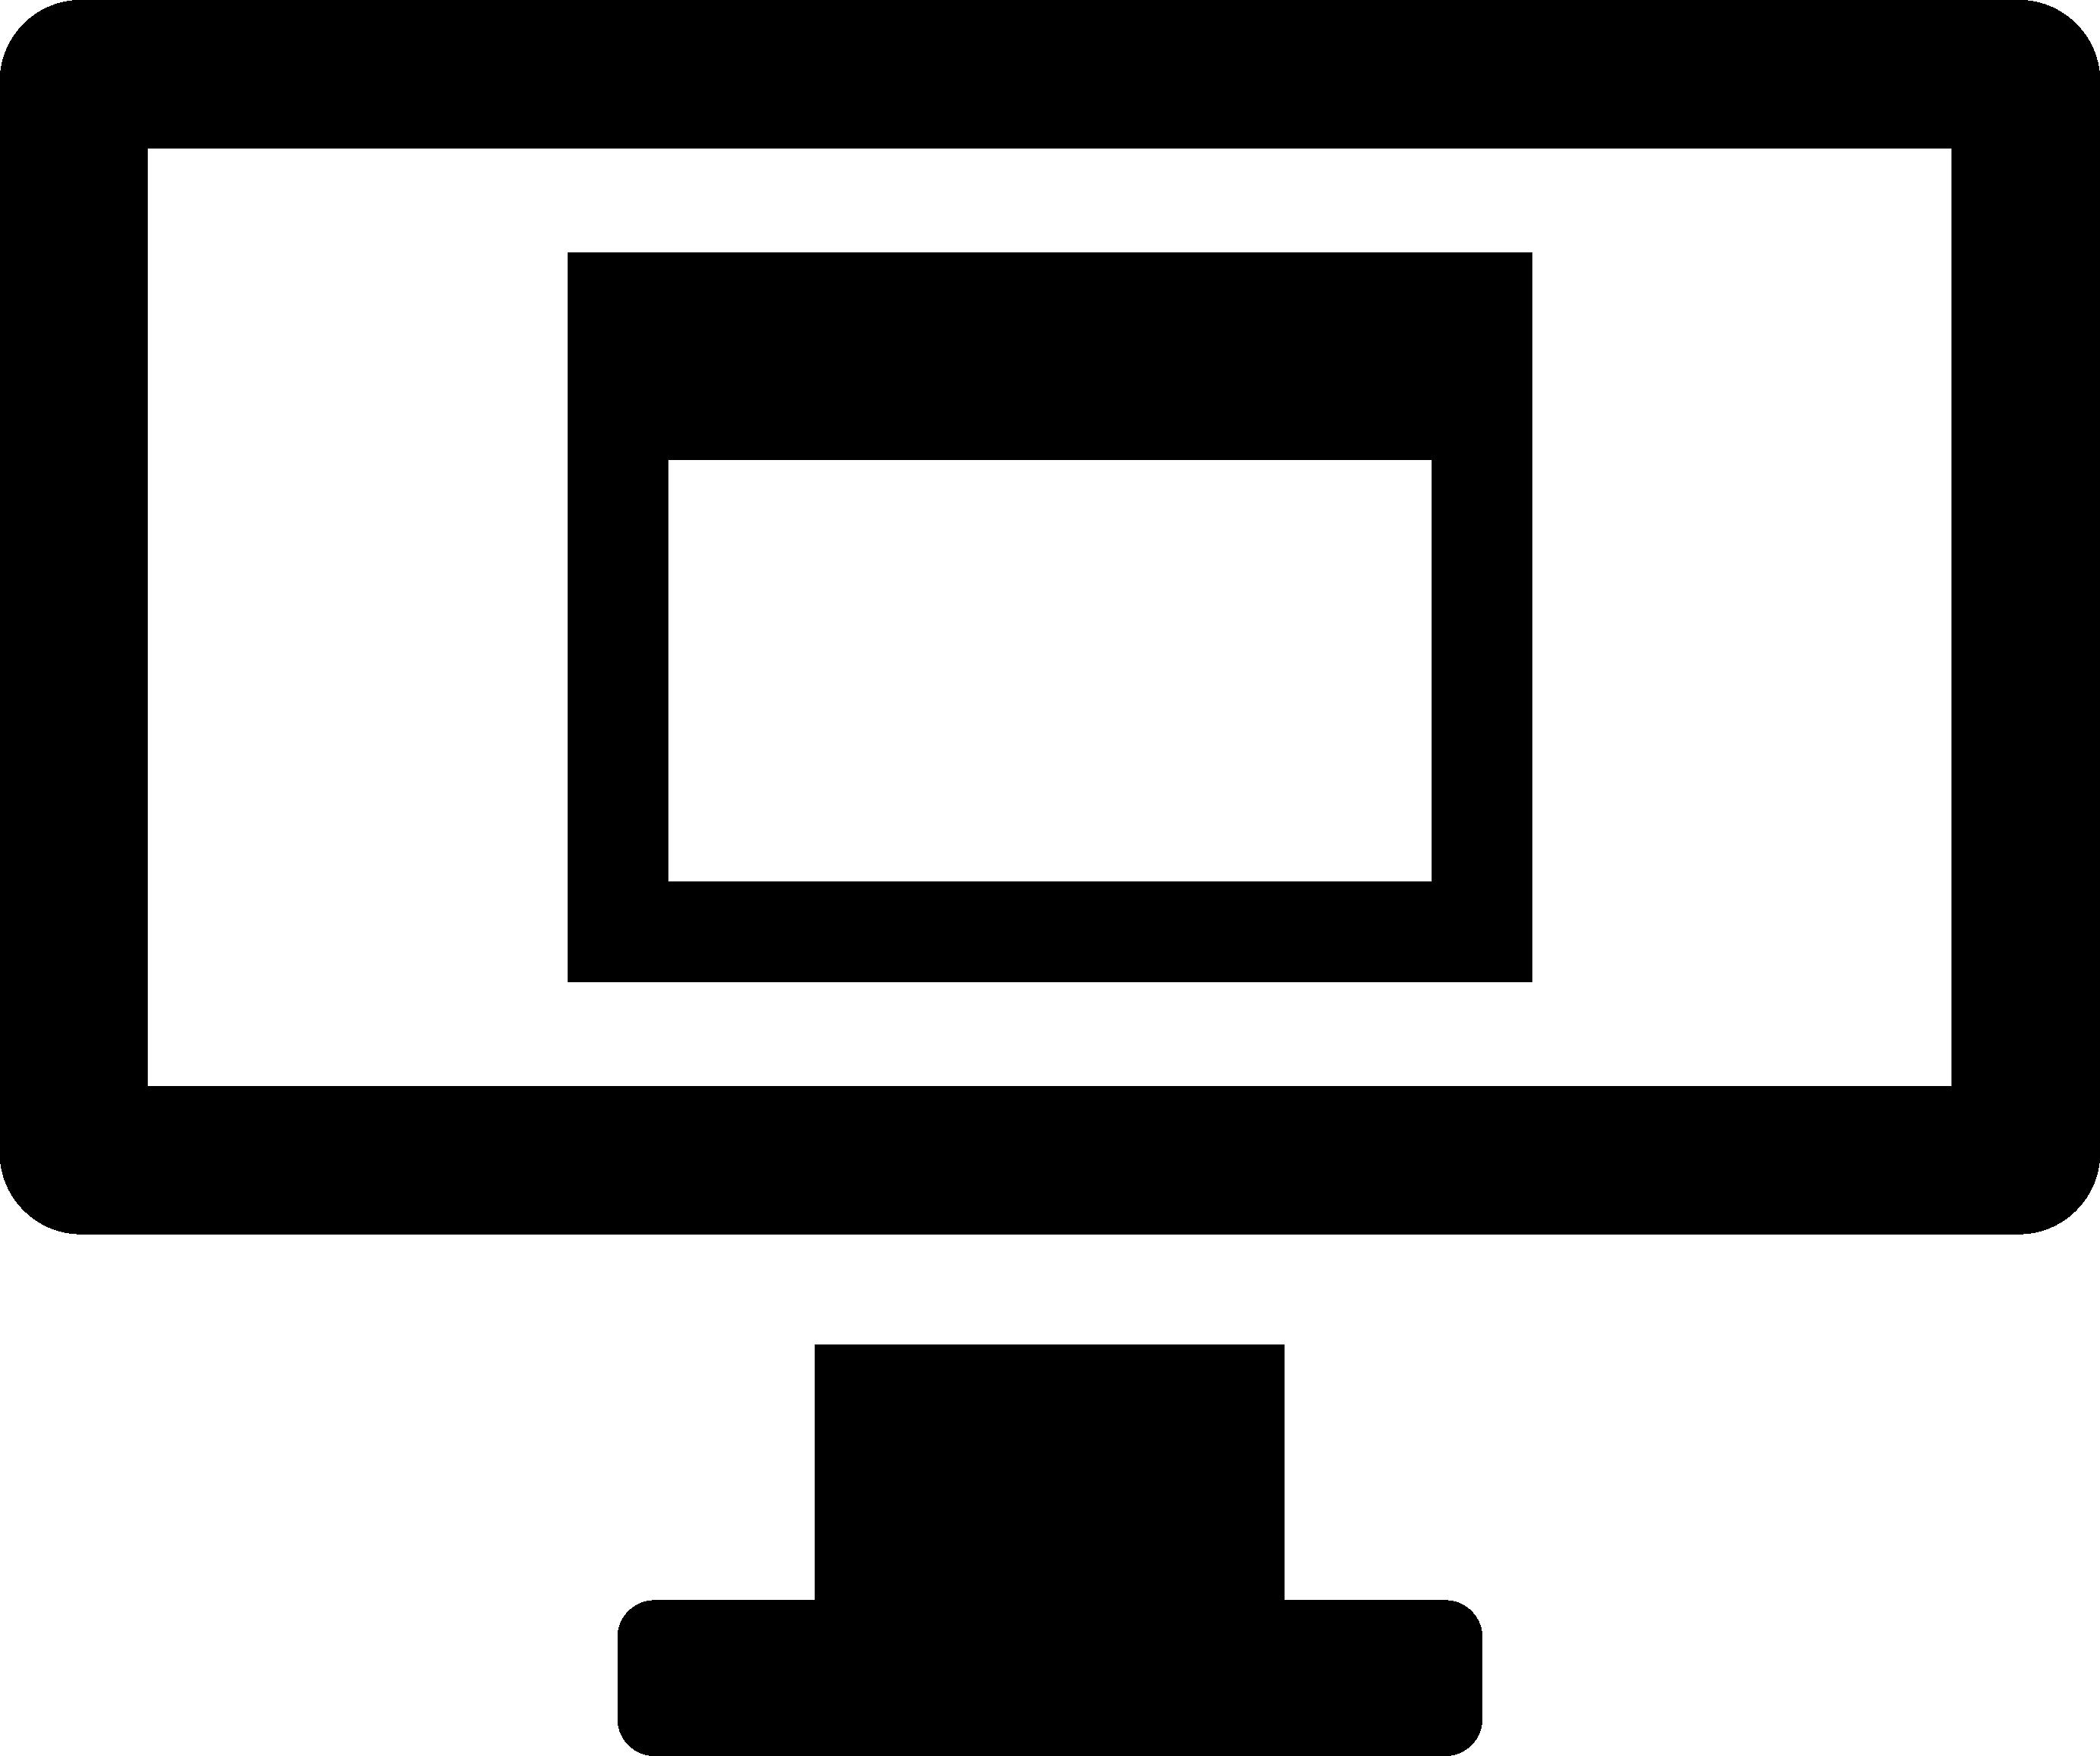 【Python】venvによる仮想環境構築